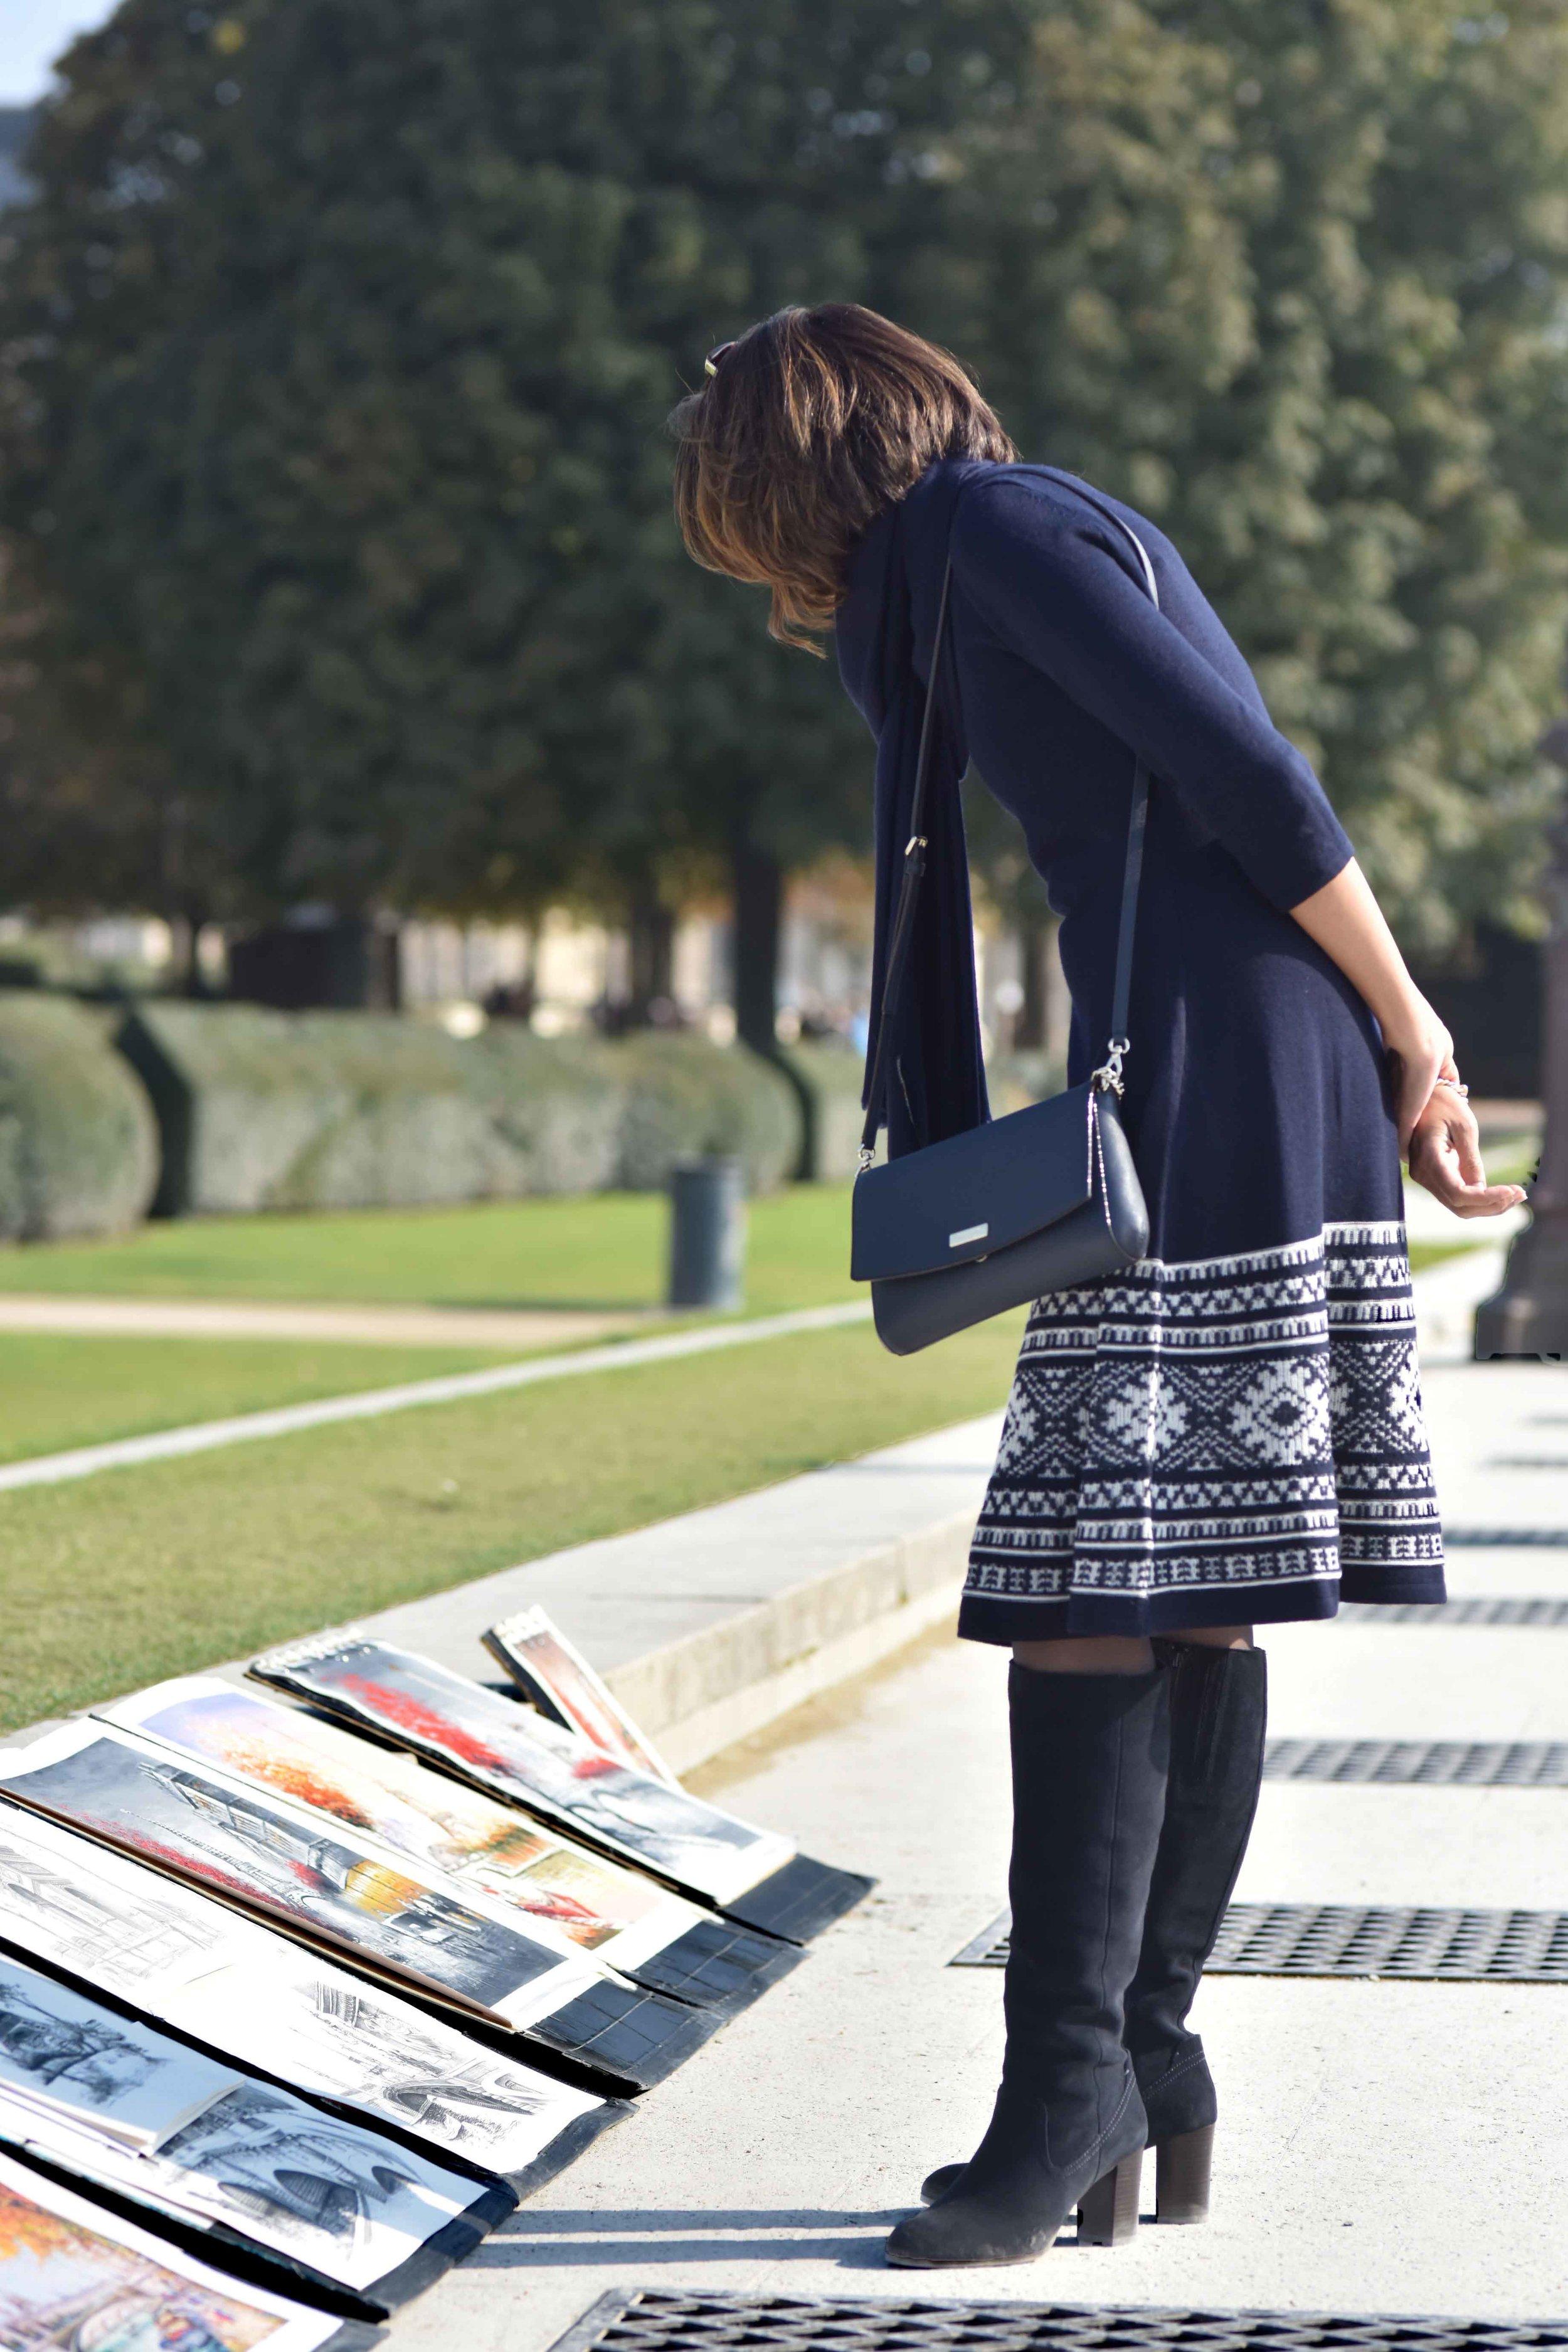 Ralph Lauren woolen jersey knit dress, Marks & Spencer knee high boots, Kate Spade sling bag, Jardin de Tuileries, Paris. Photo: Nina Shaw. Image©sourcingstyle.com